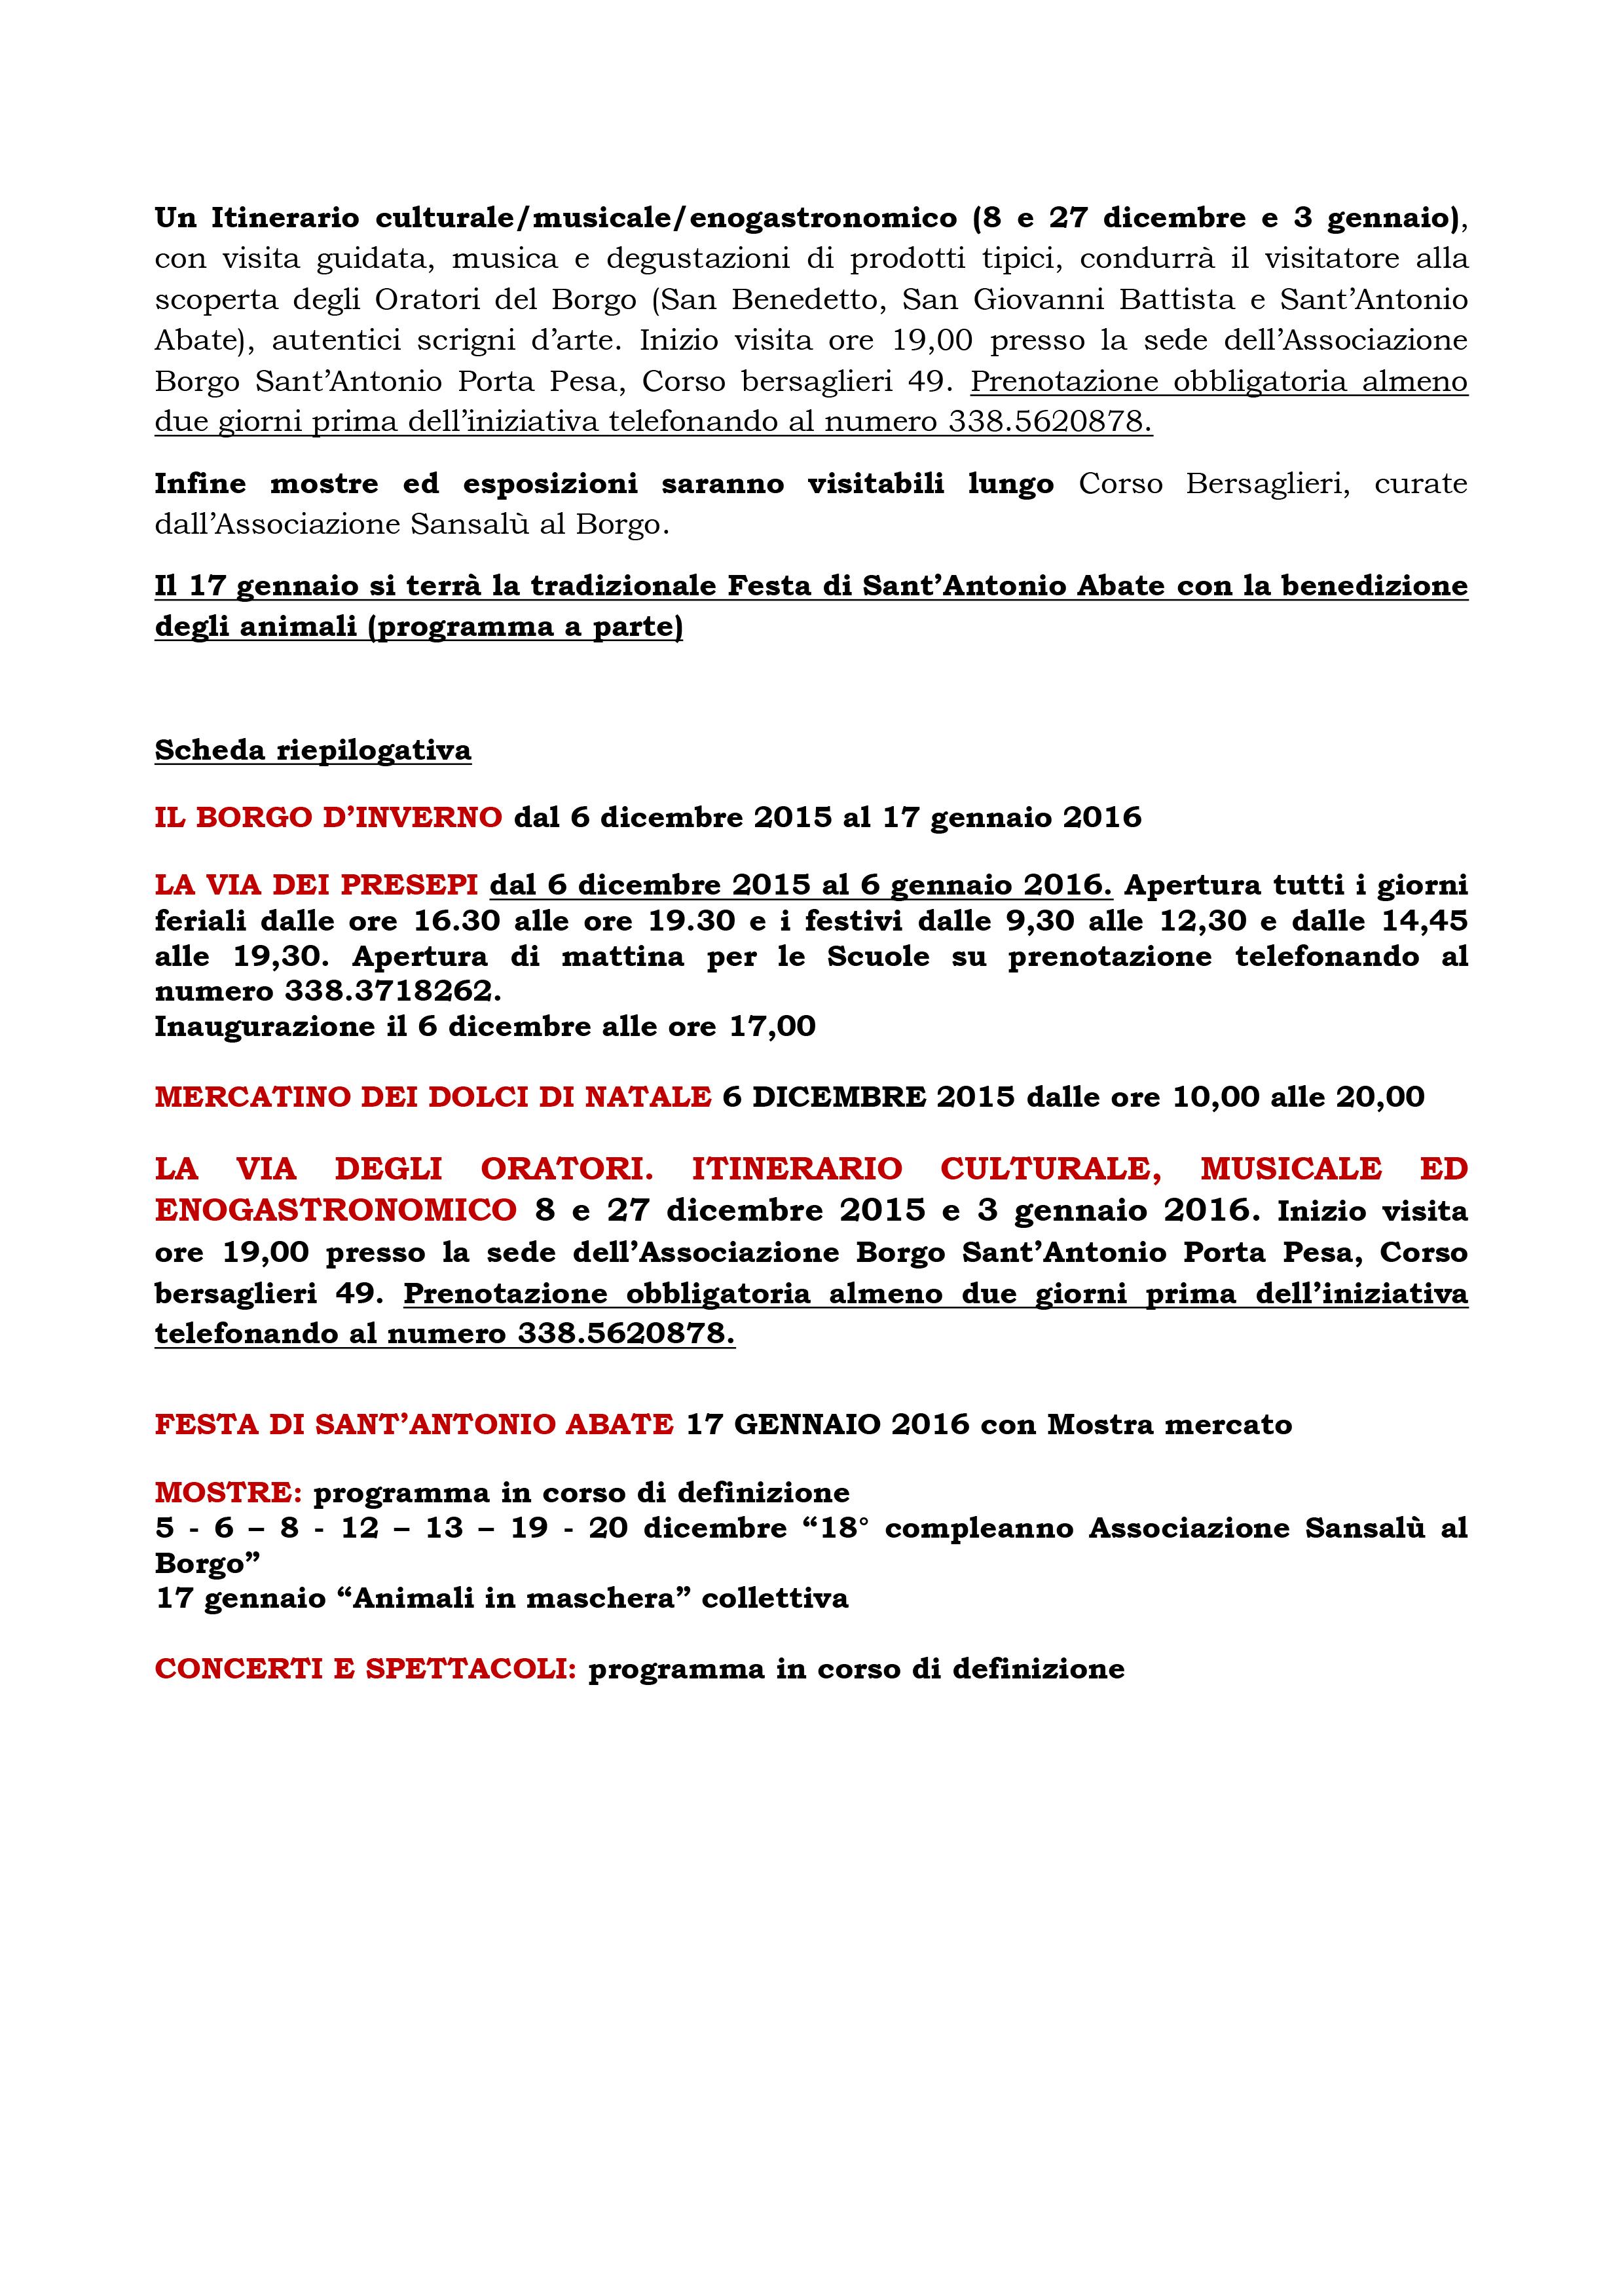 natale 2015-2